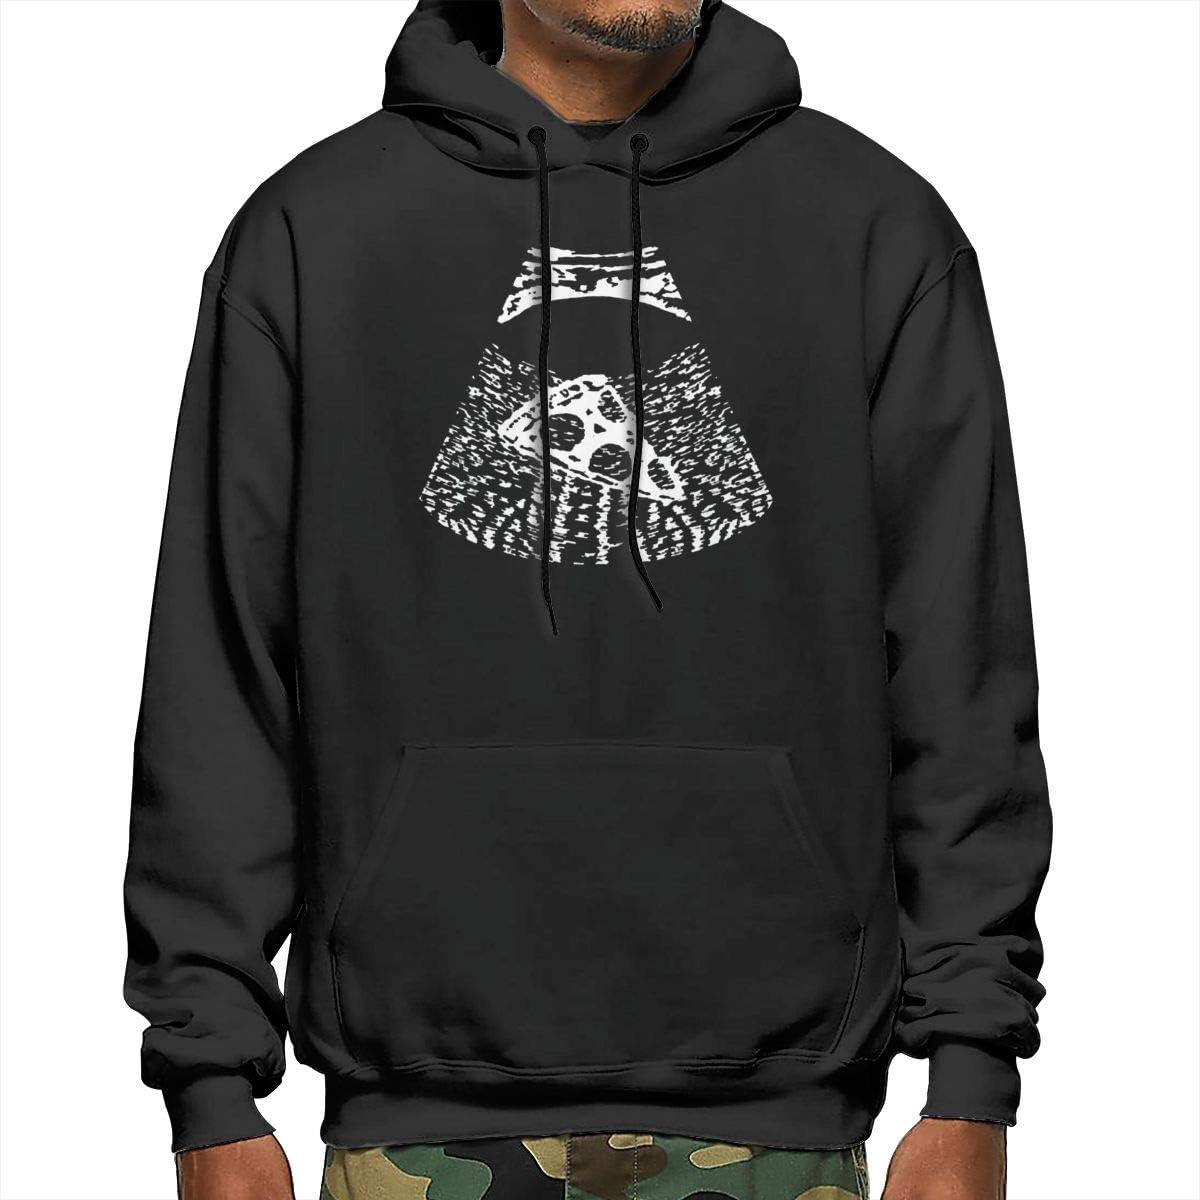 Ultrasonic Pizza Hoodie Boys Girl lowest price Sweatshir Discount is also underway Long Pullover Sleeve